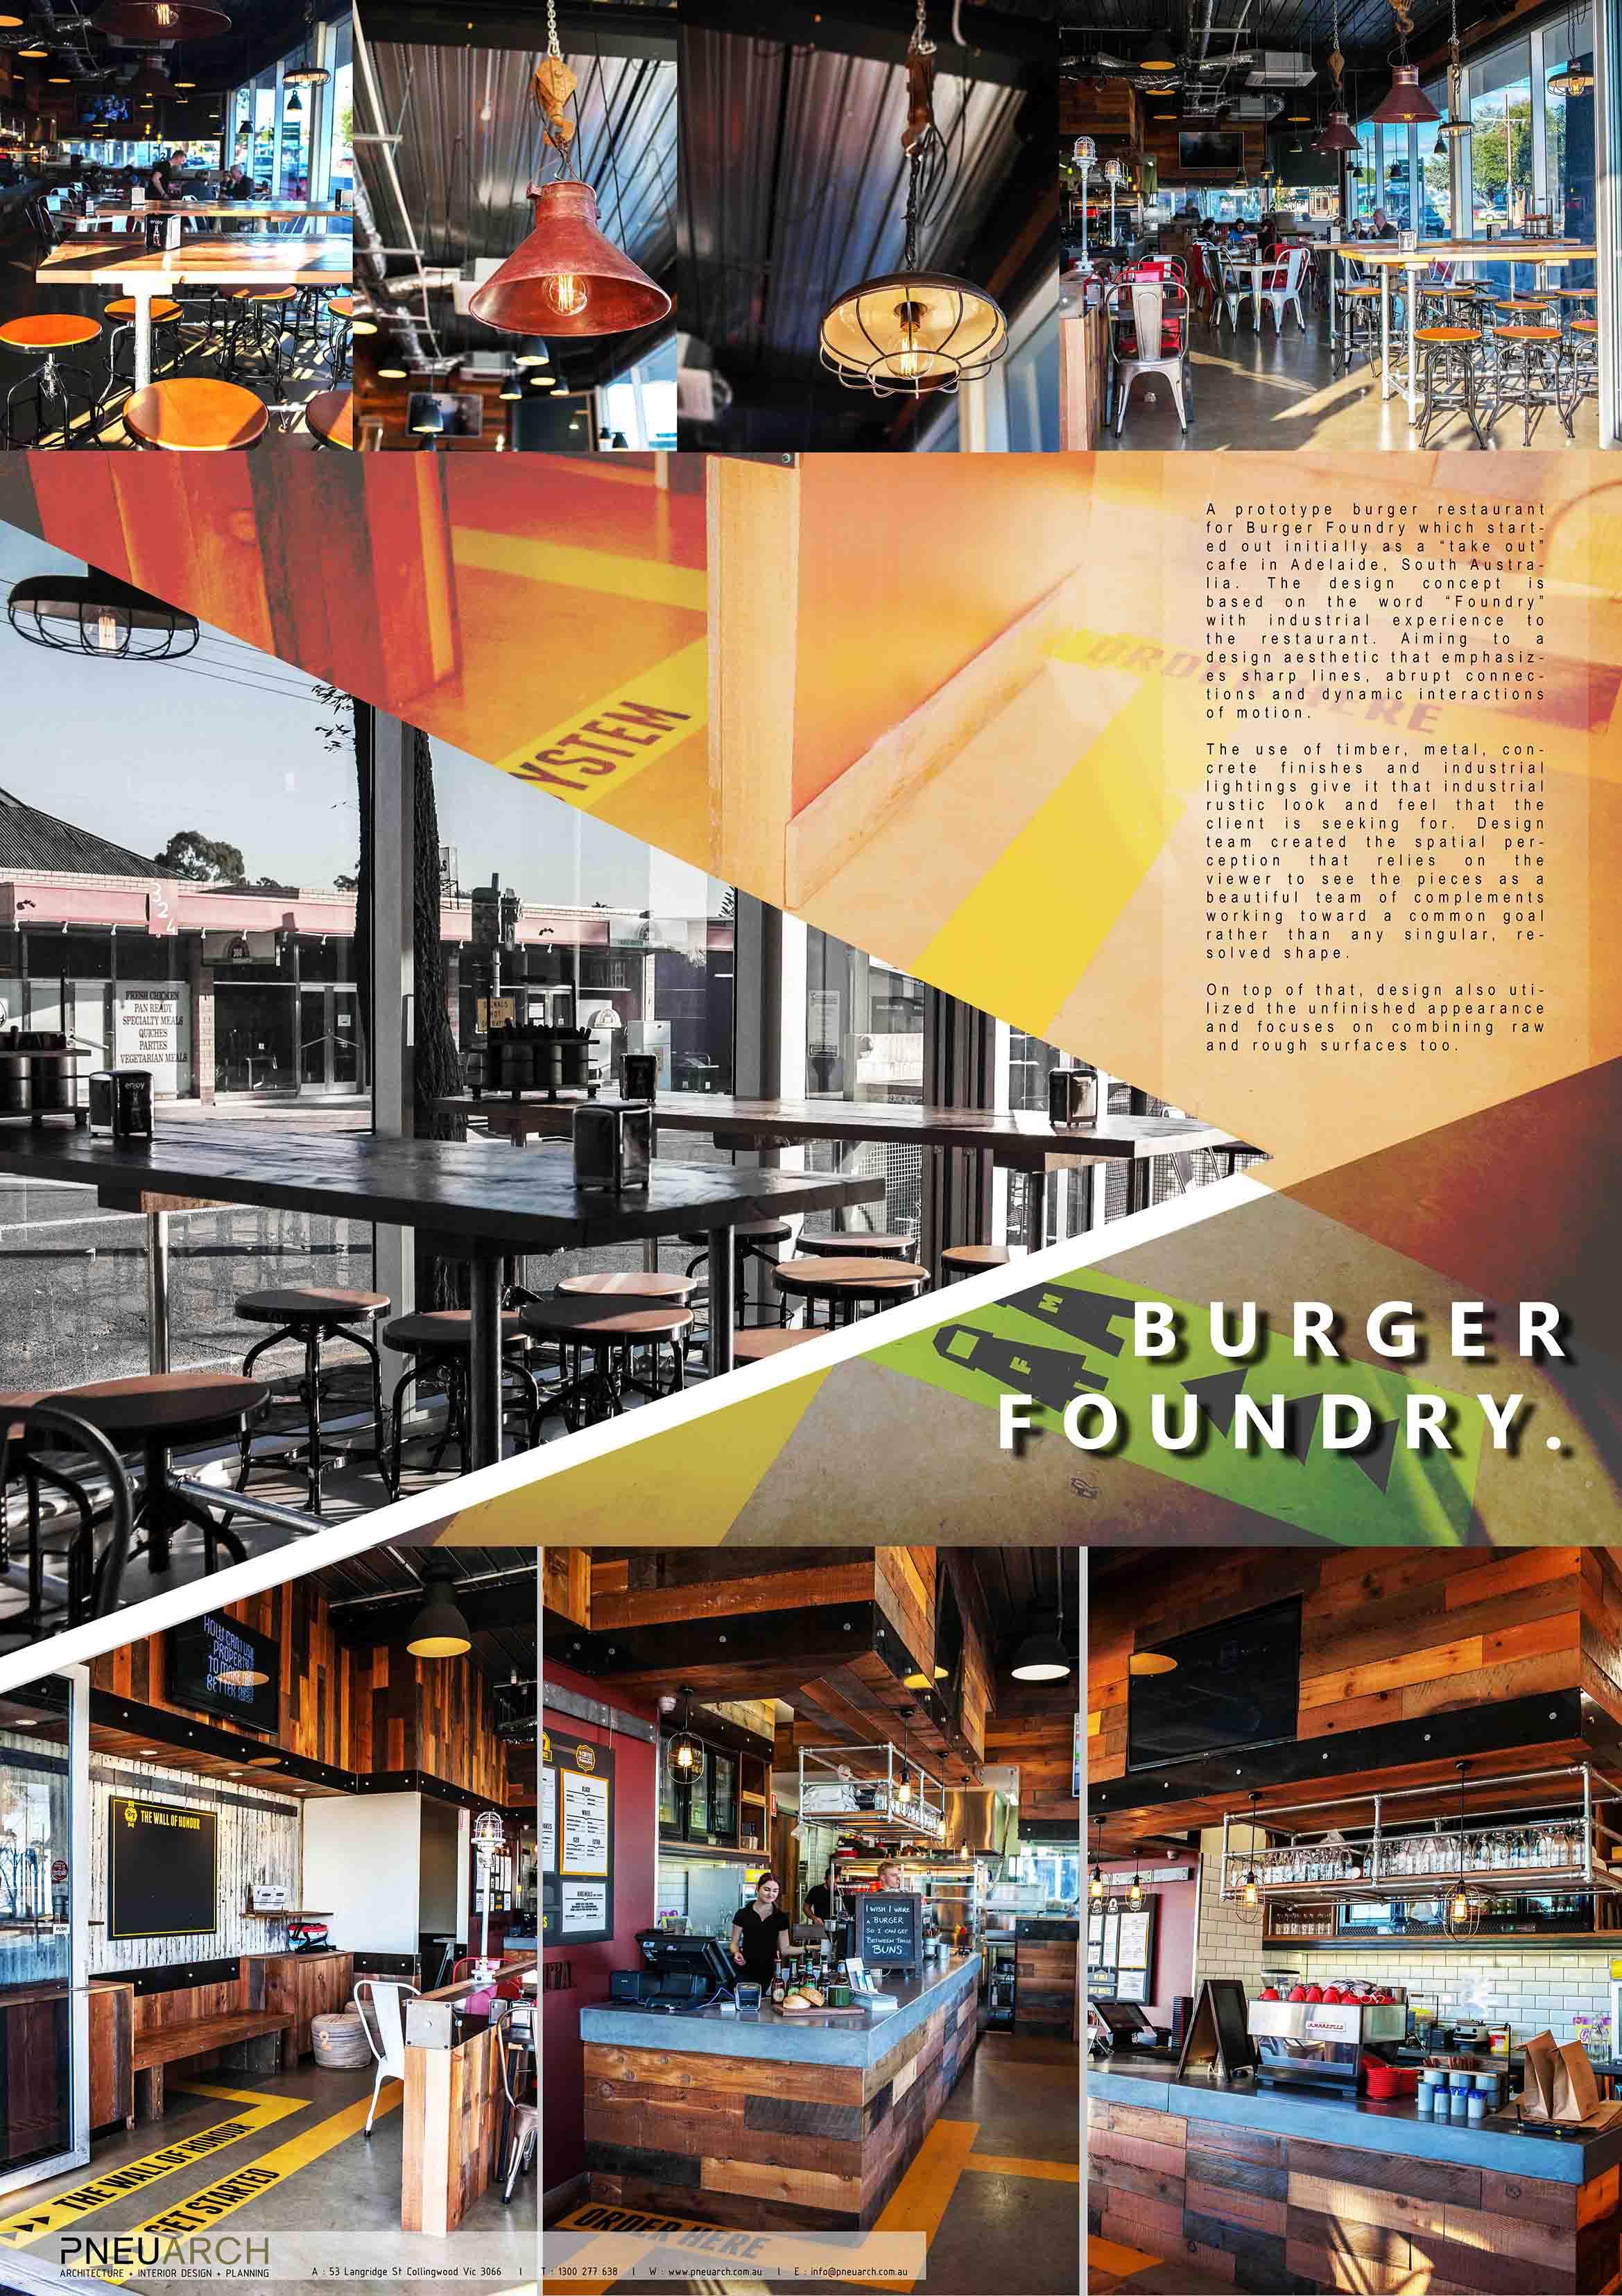 Burger Foundry